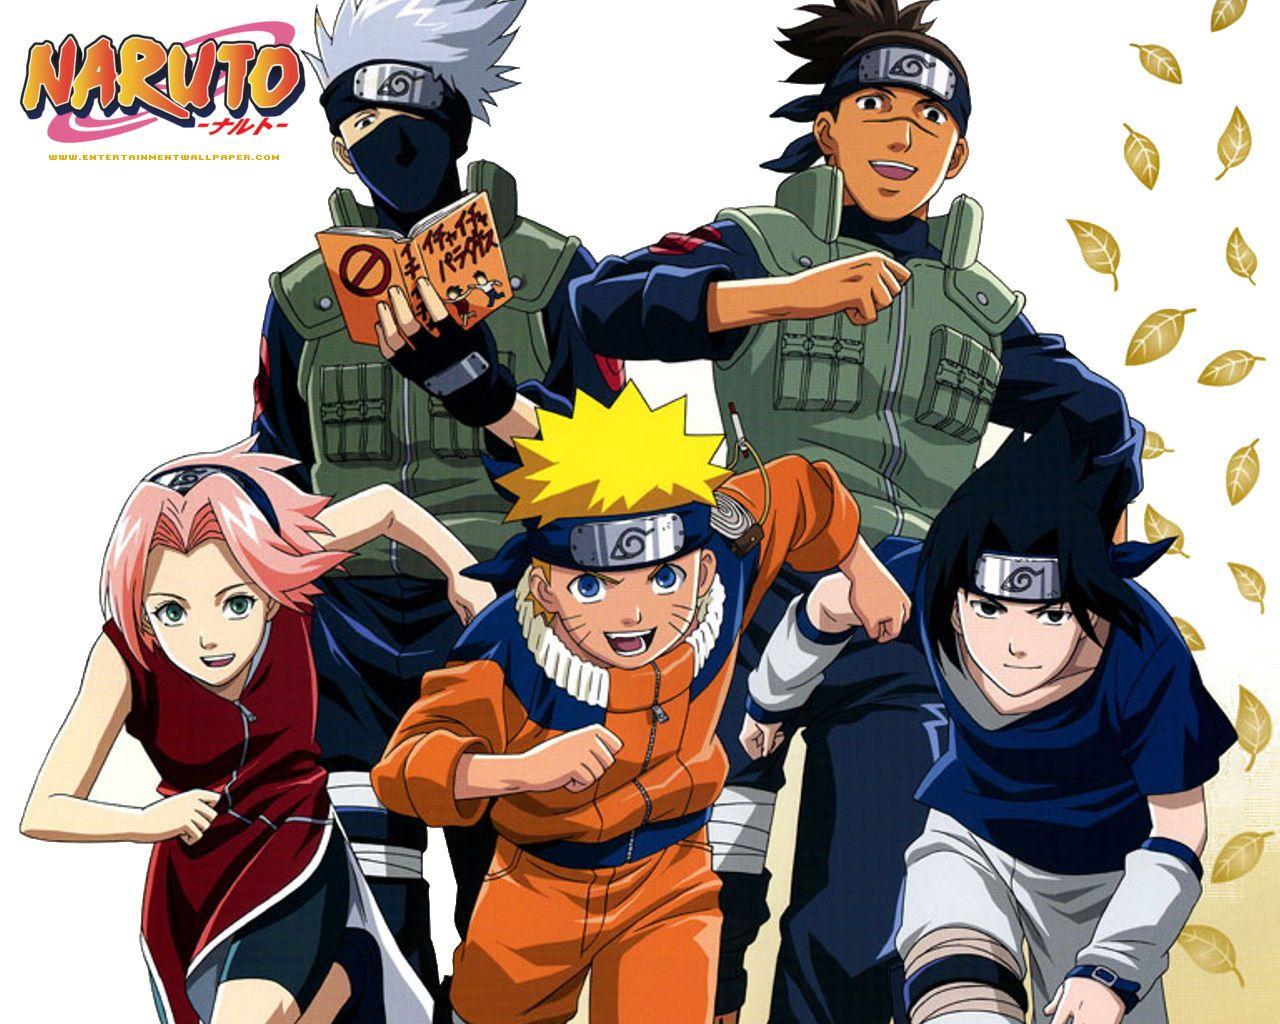 Naruto watch order